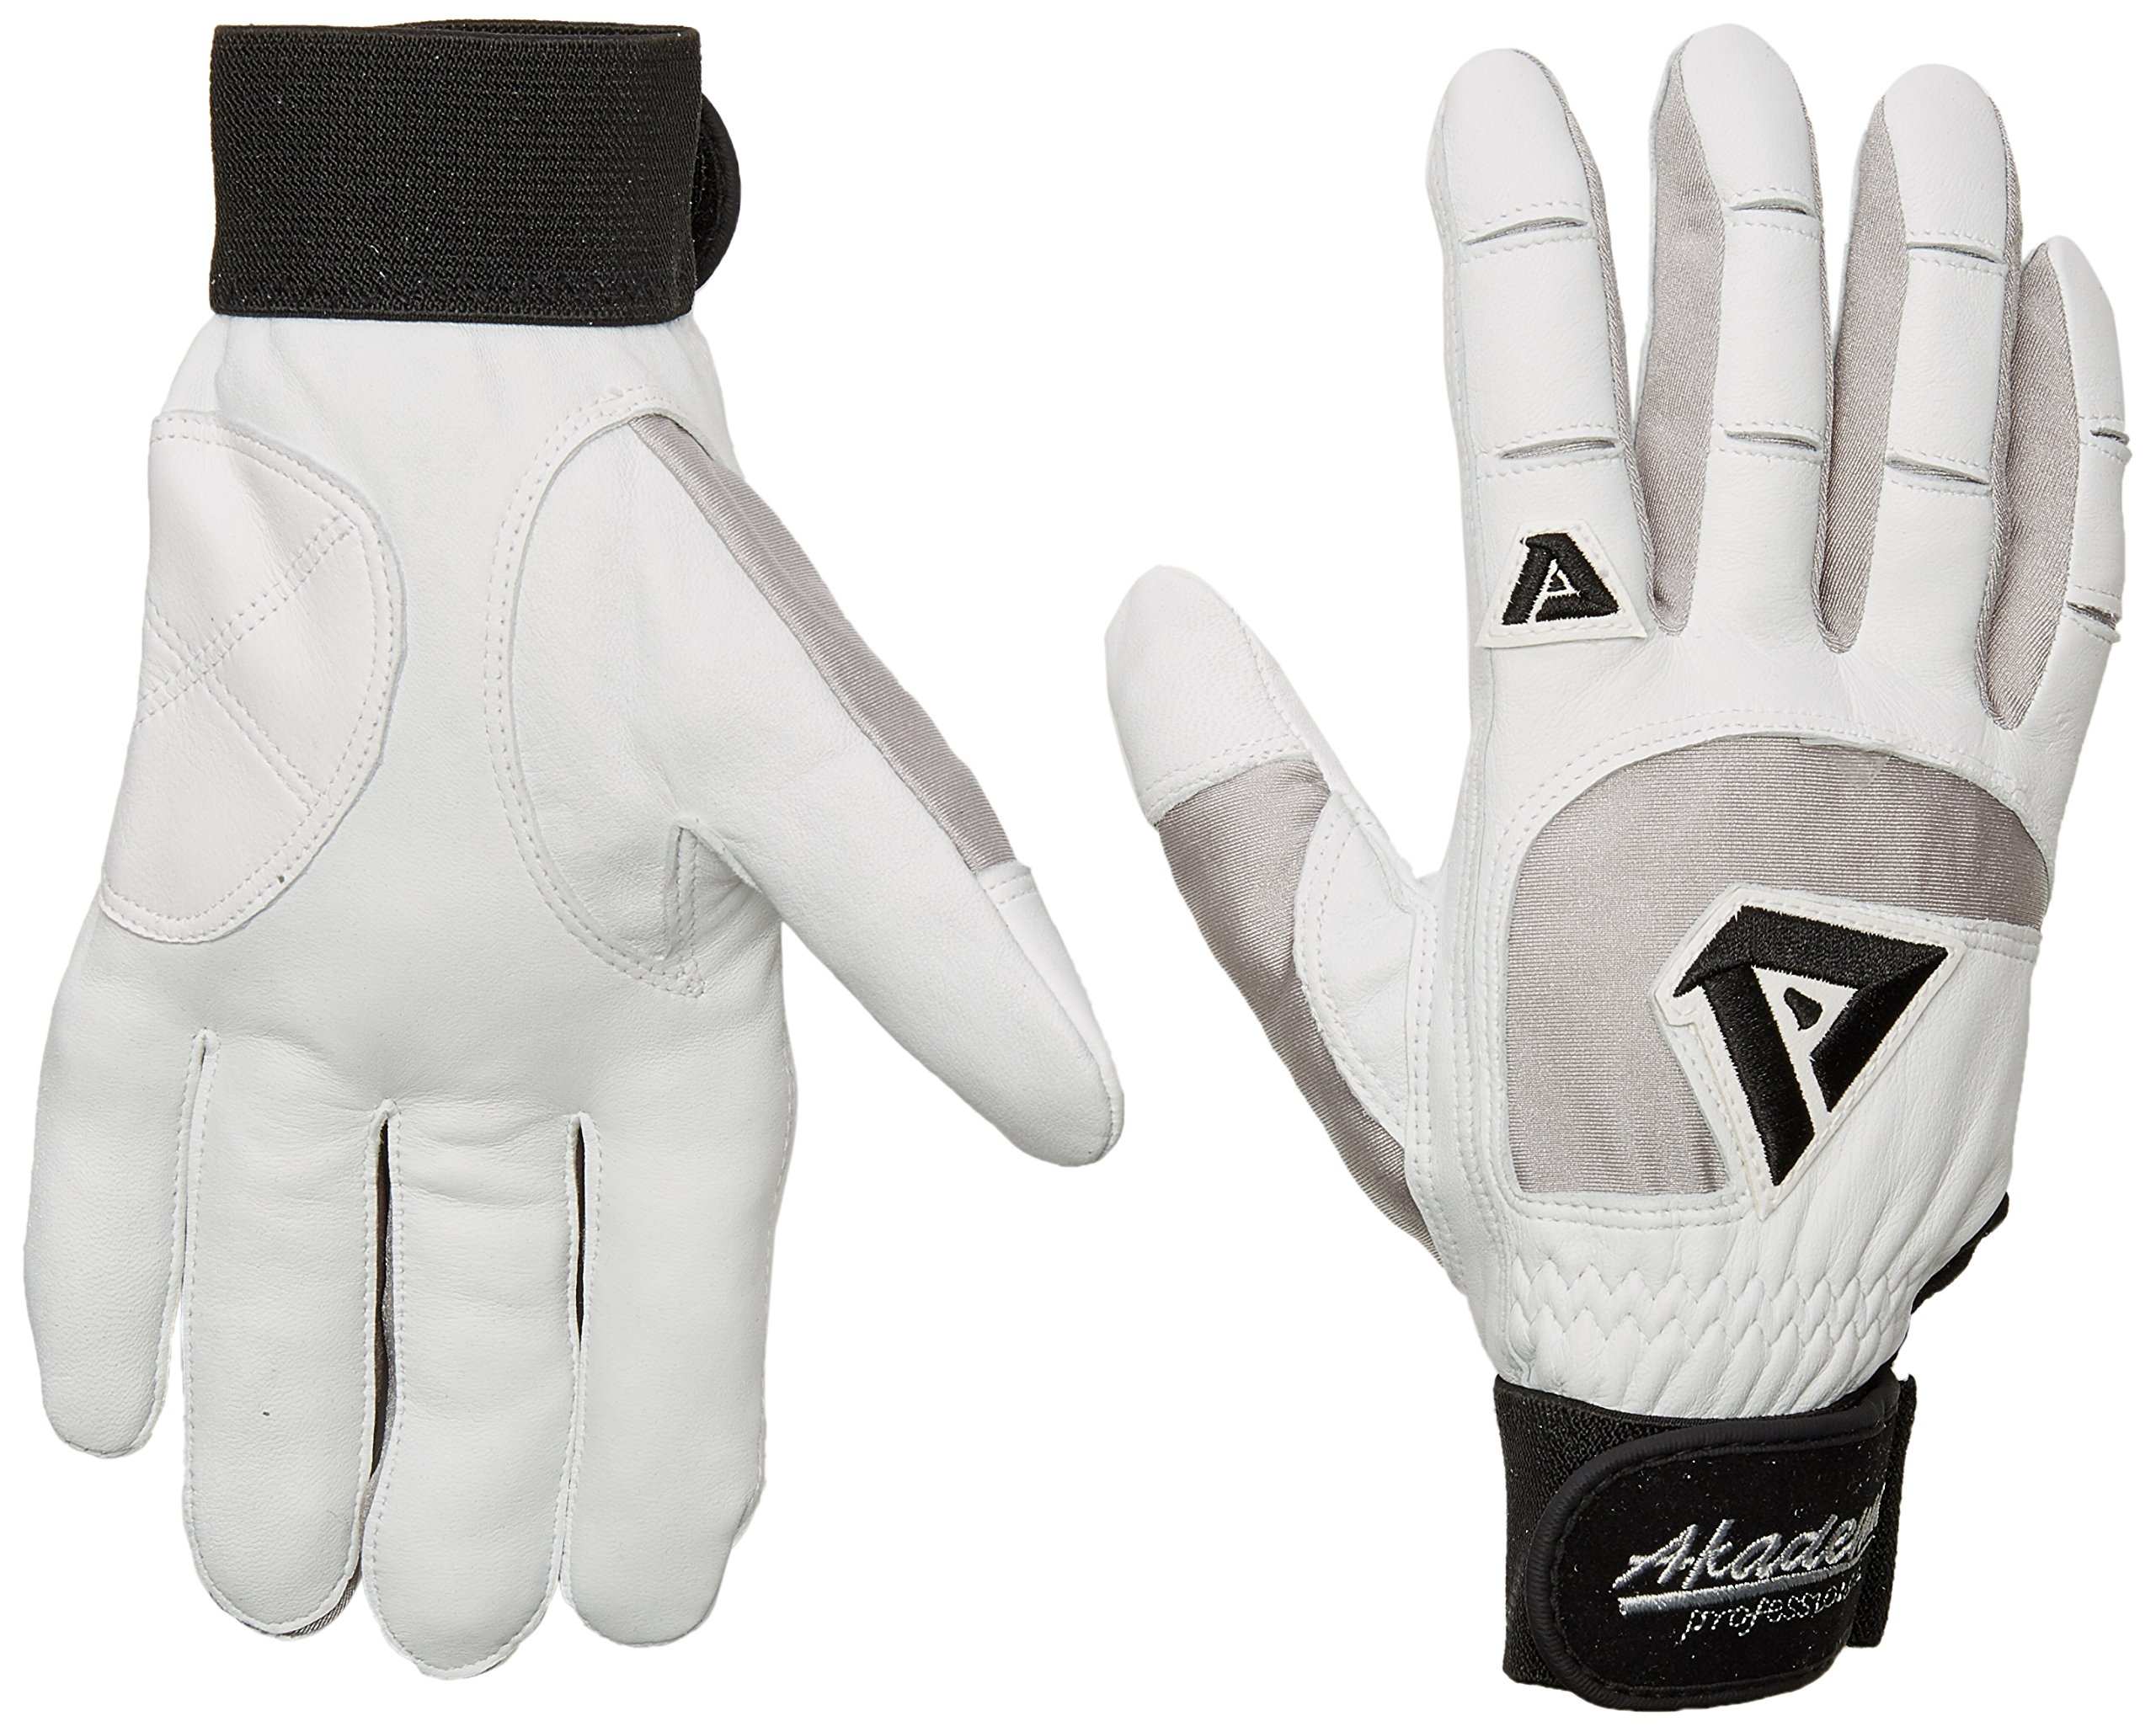 Akadema Professional Batting Gloves (White/Grey, X-Small)